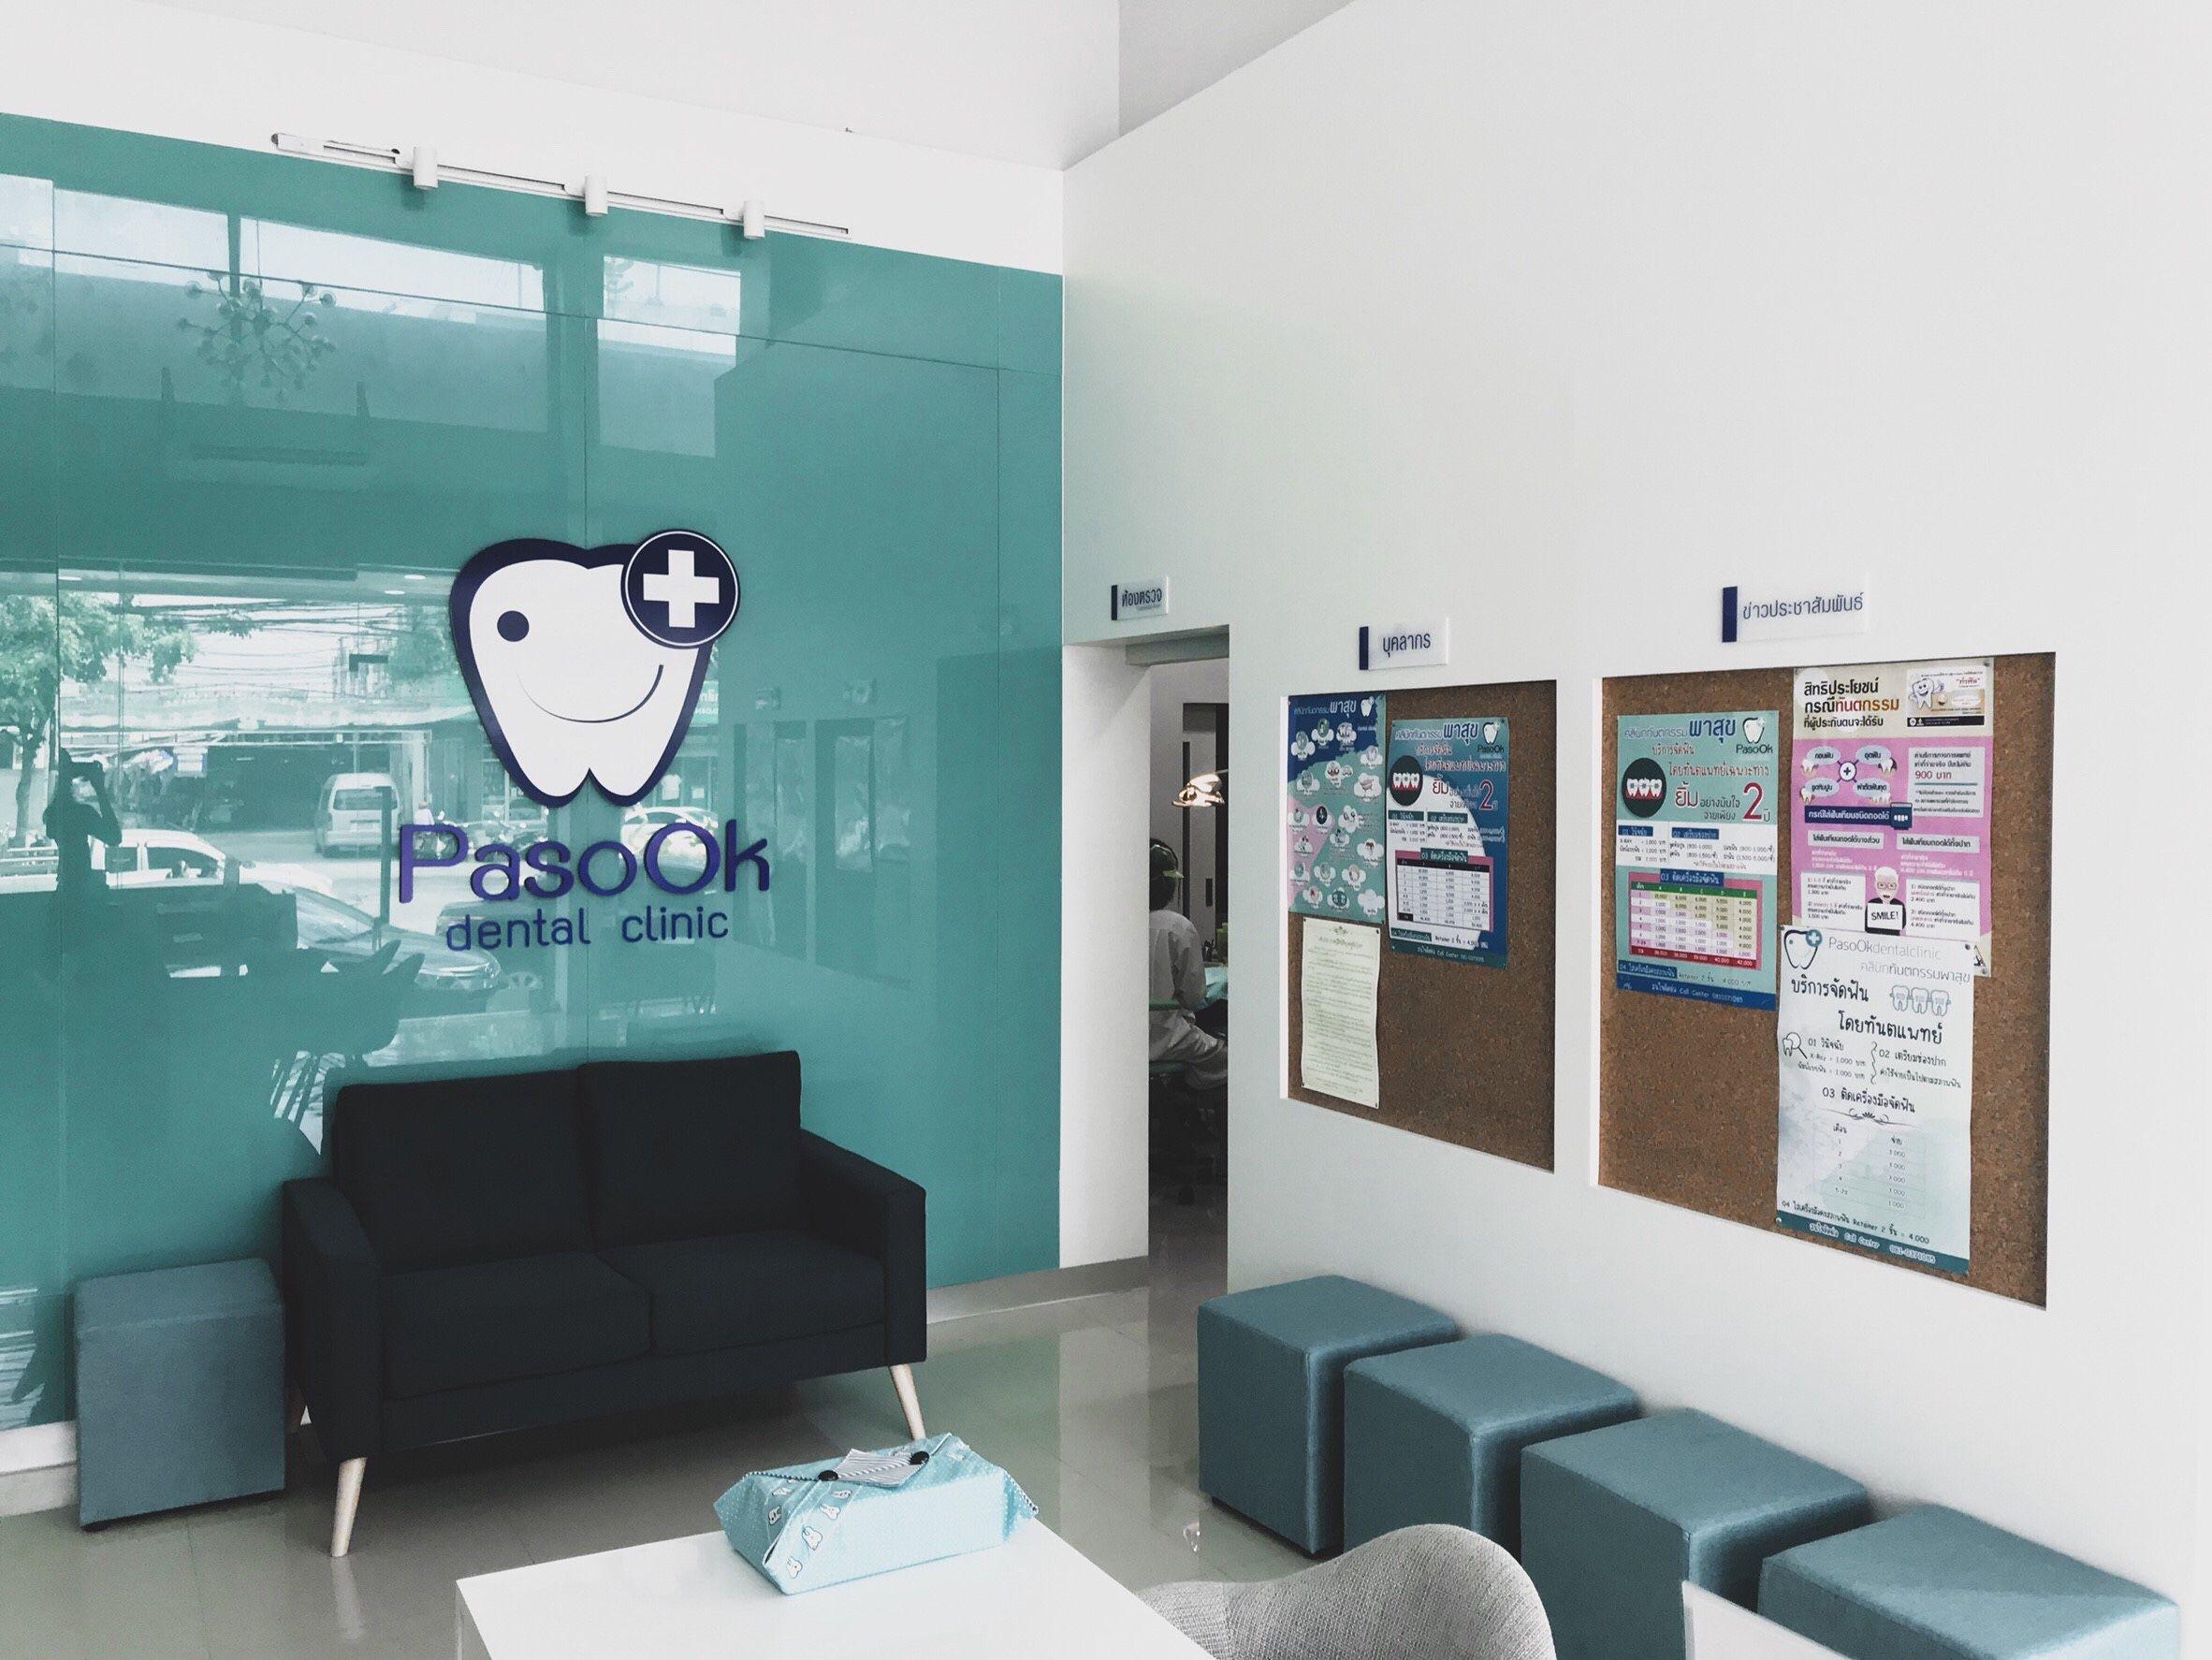 Pasook dental clinic Clinica dental, Dental